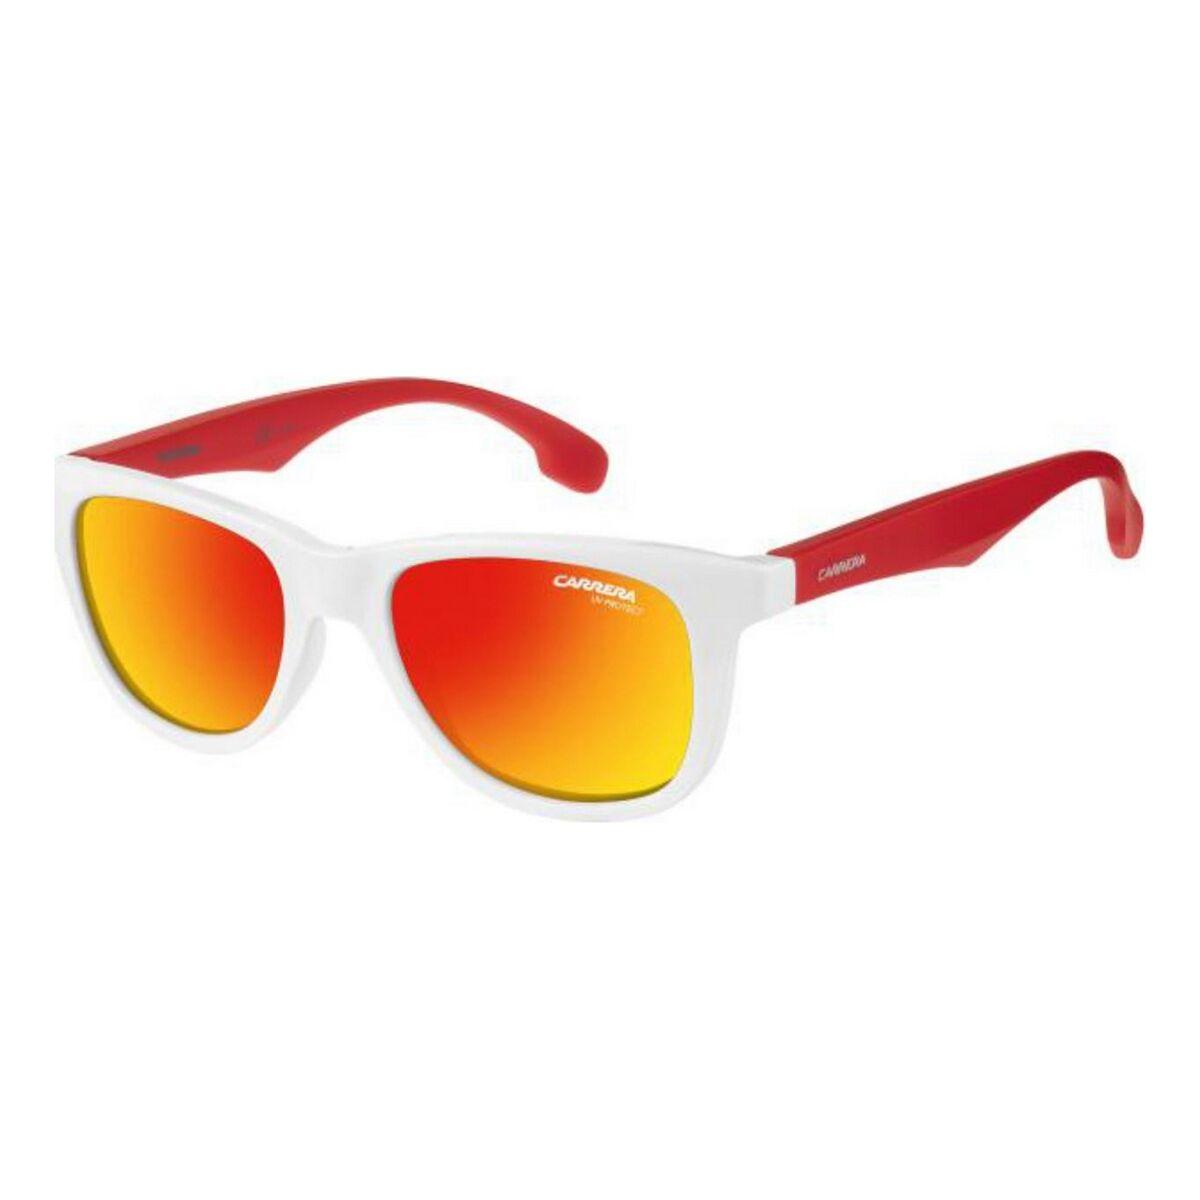 Child Sunglasses Carrera 20-5SK46UZ White (Ø 46 mm) (Red)